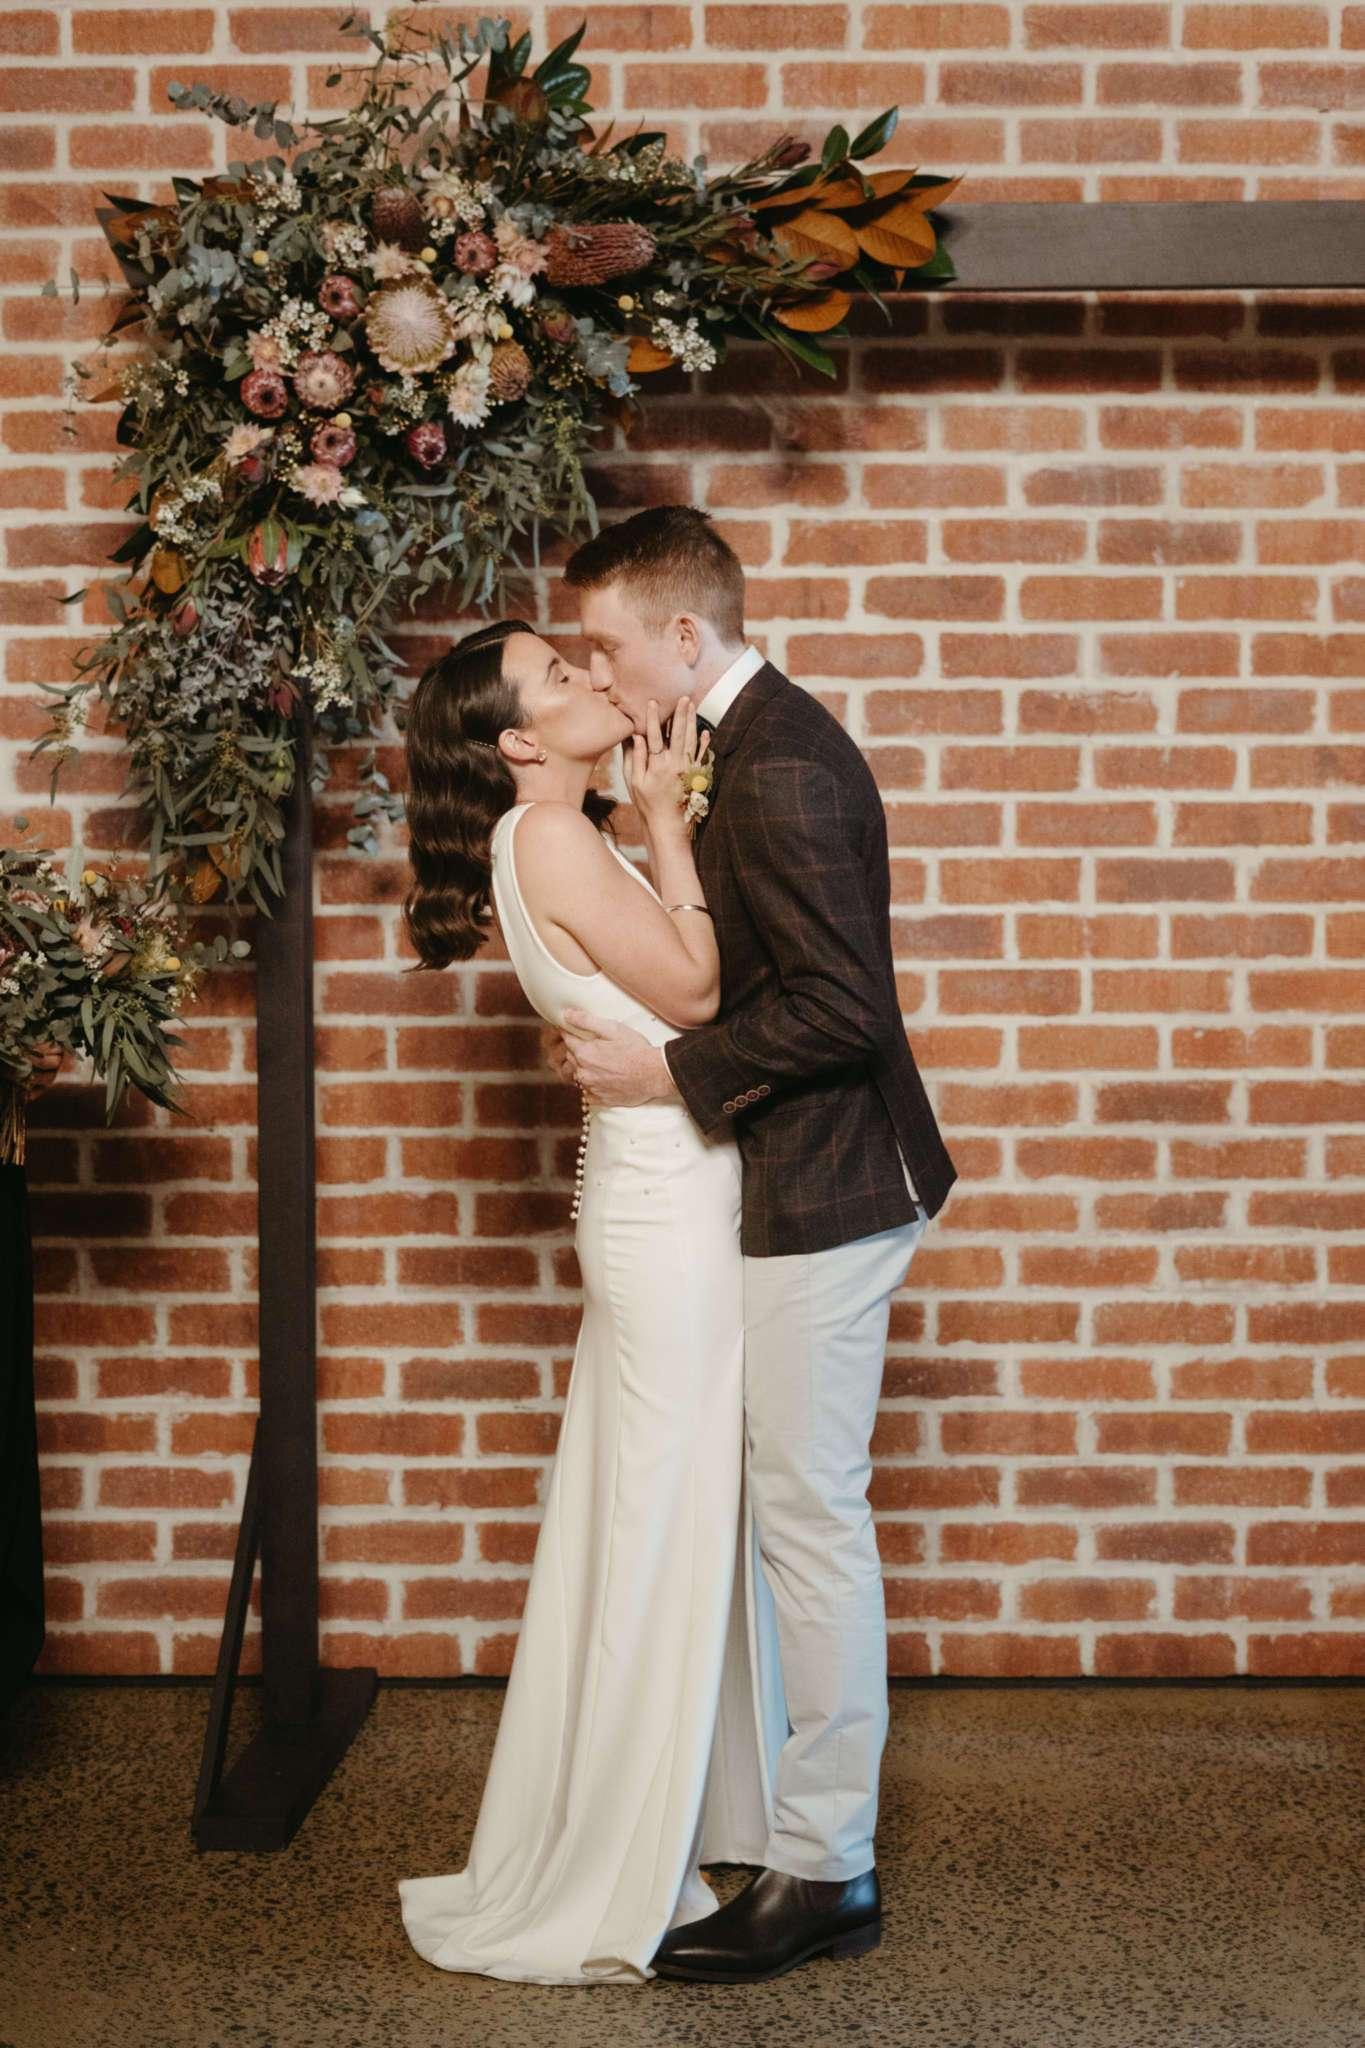 Wedding Ceremony - Brisbane